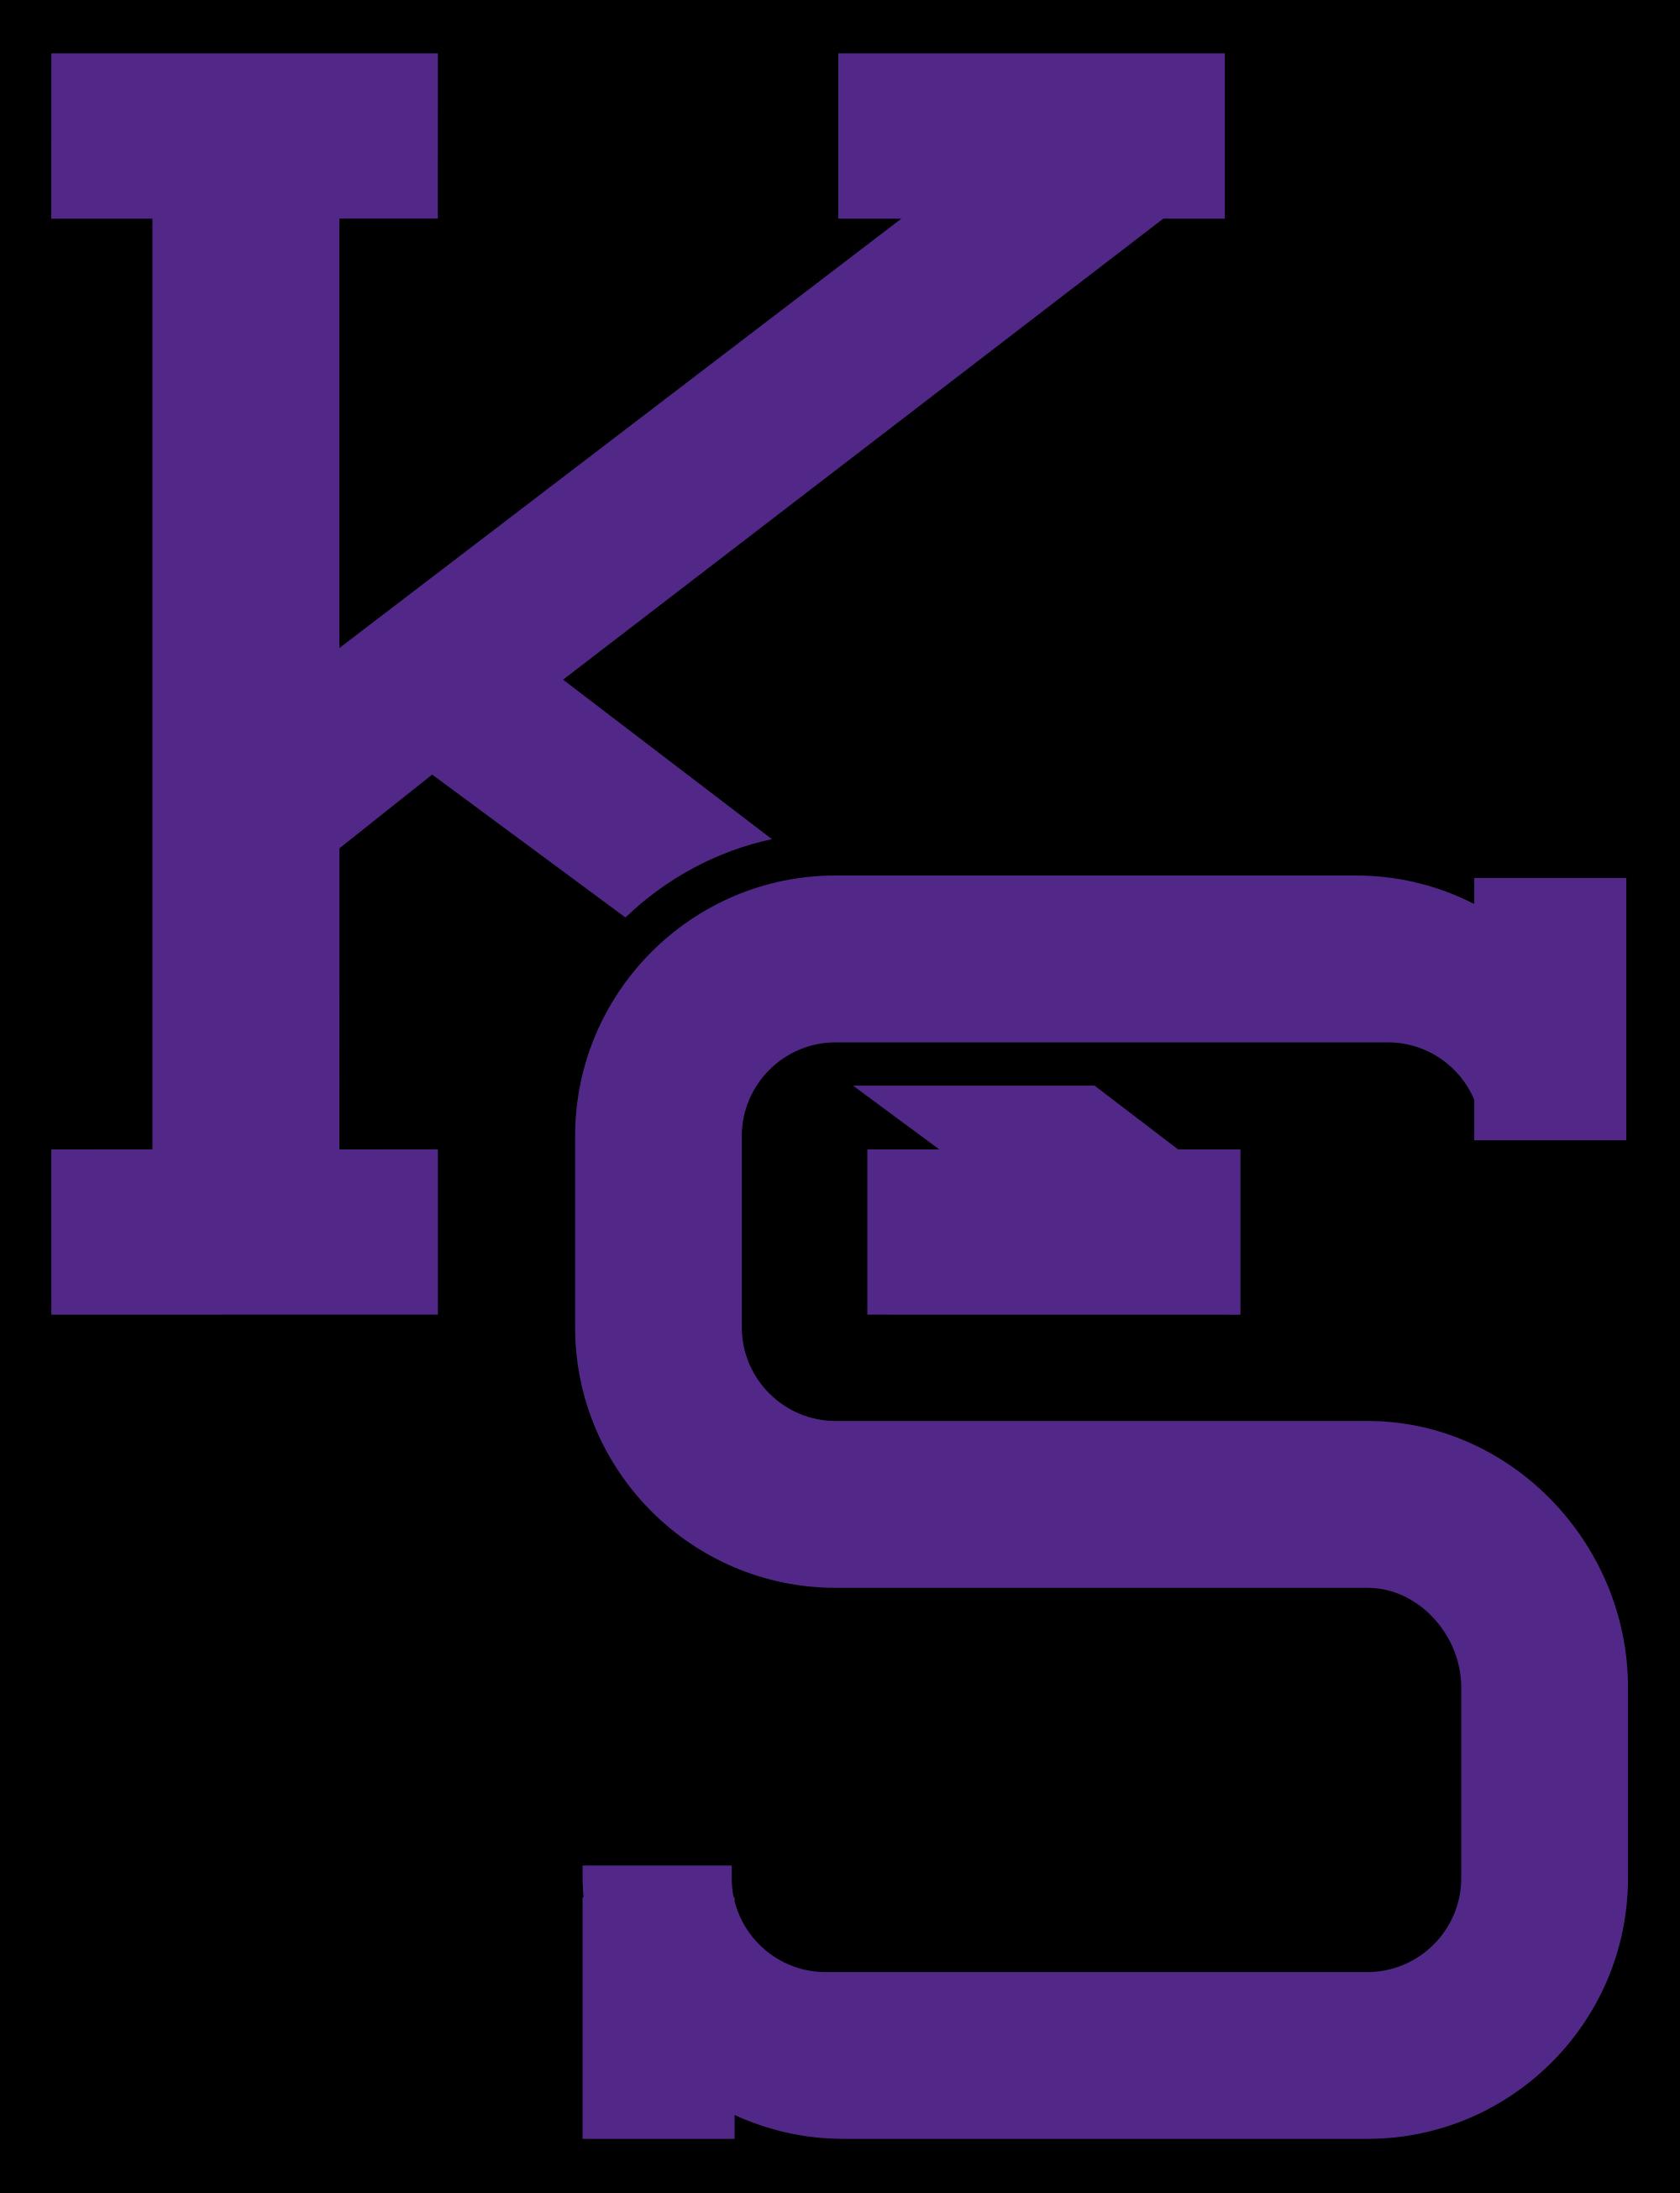 Purple clipart wildcat. Kansas state wildcats baseball